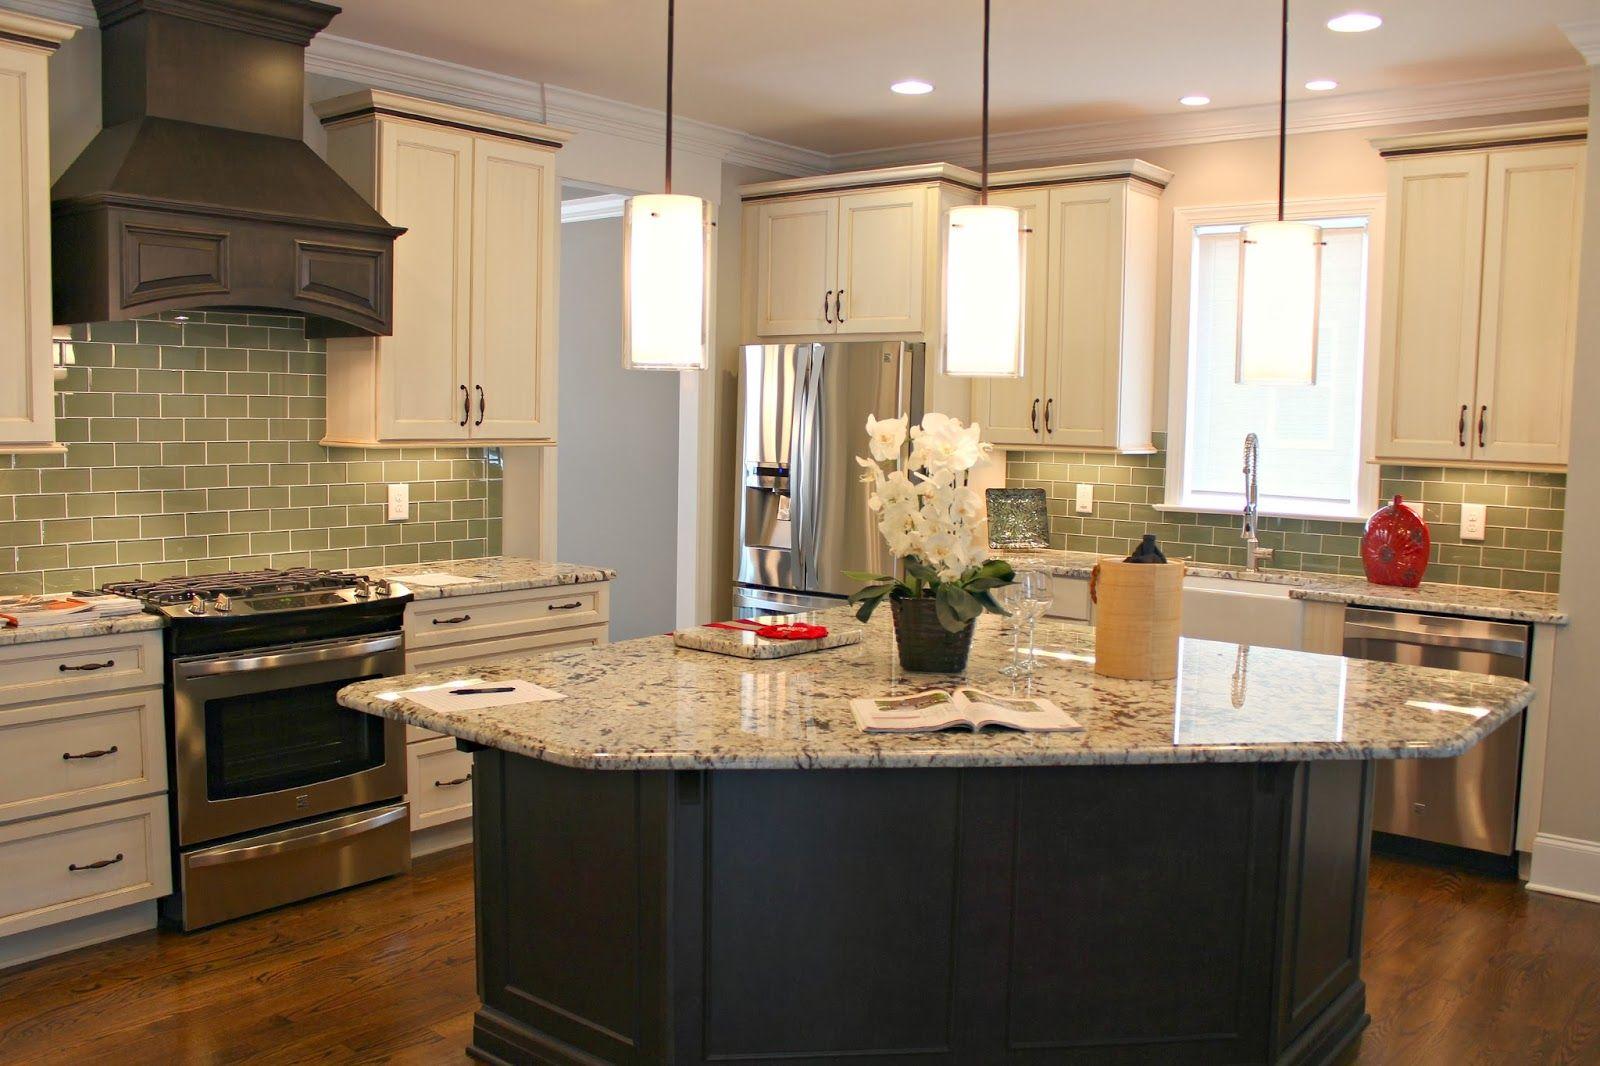 Furniture Wonderfull Triangular Kitchen Island With Beige Marble Top Nice Black Gloss Body Cool Clas Kitchen Triangle Kitchen Center Island Curved Kitchen